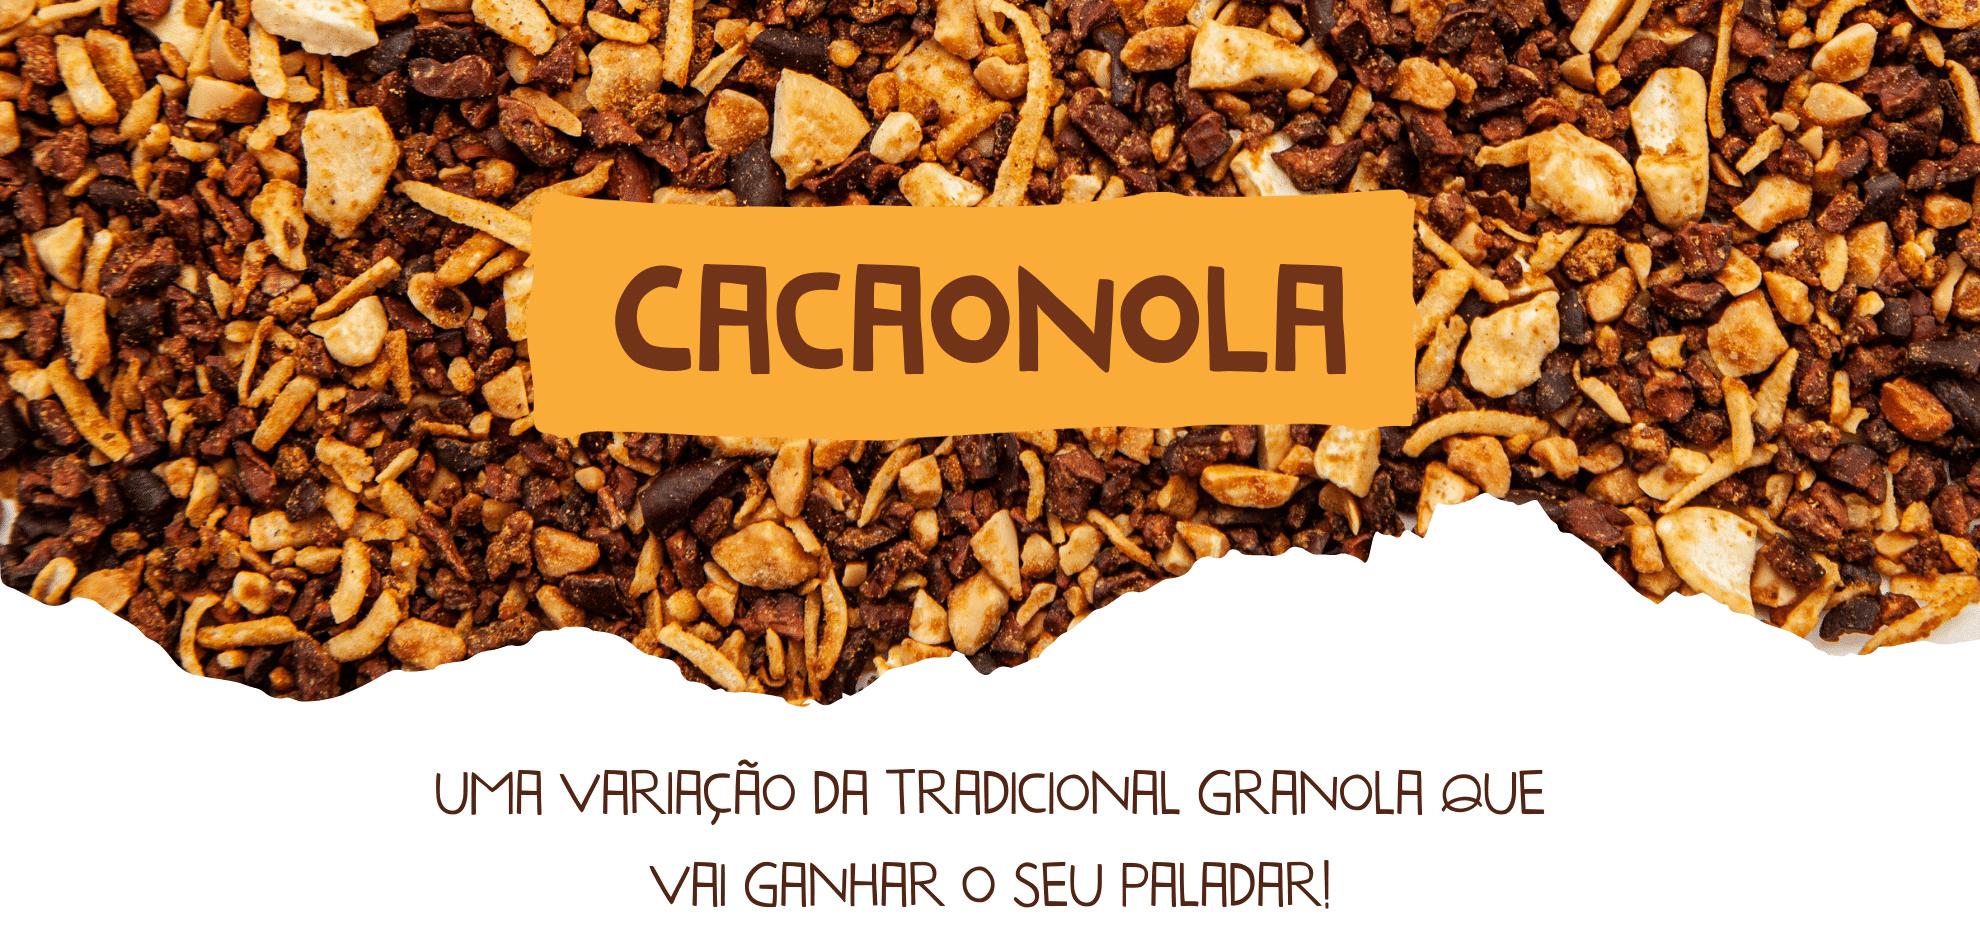 cacaonola cookoa granola